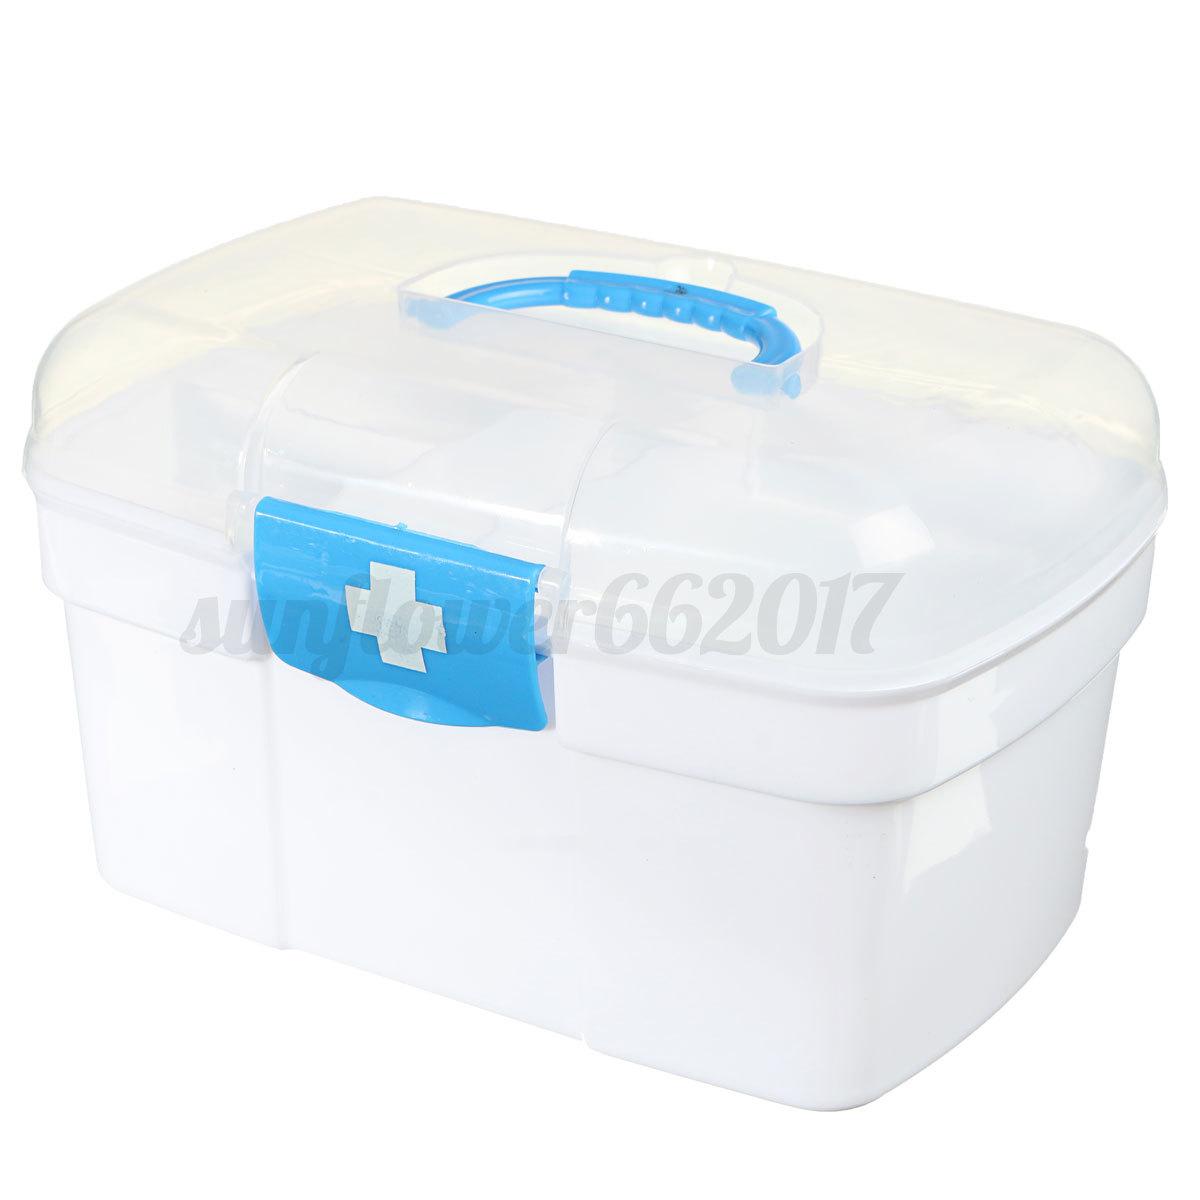 medizinbox sortierkasten f r medikamente organizer erste hilfe box hausapotheke ebay. Black Bedroom Furniture Sets. Home Design Ideas